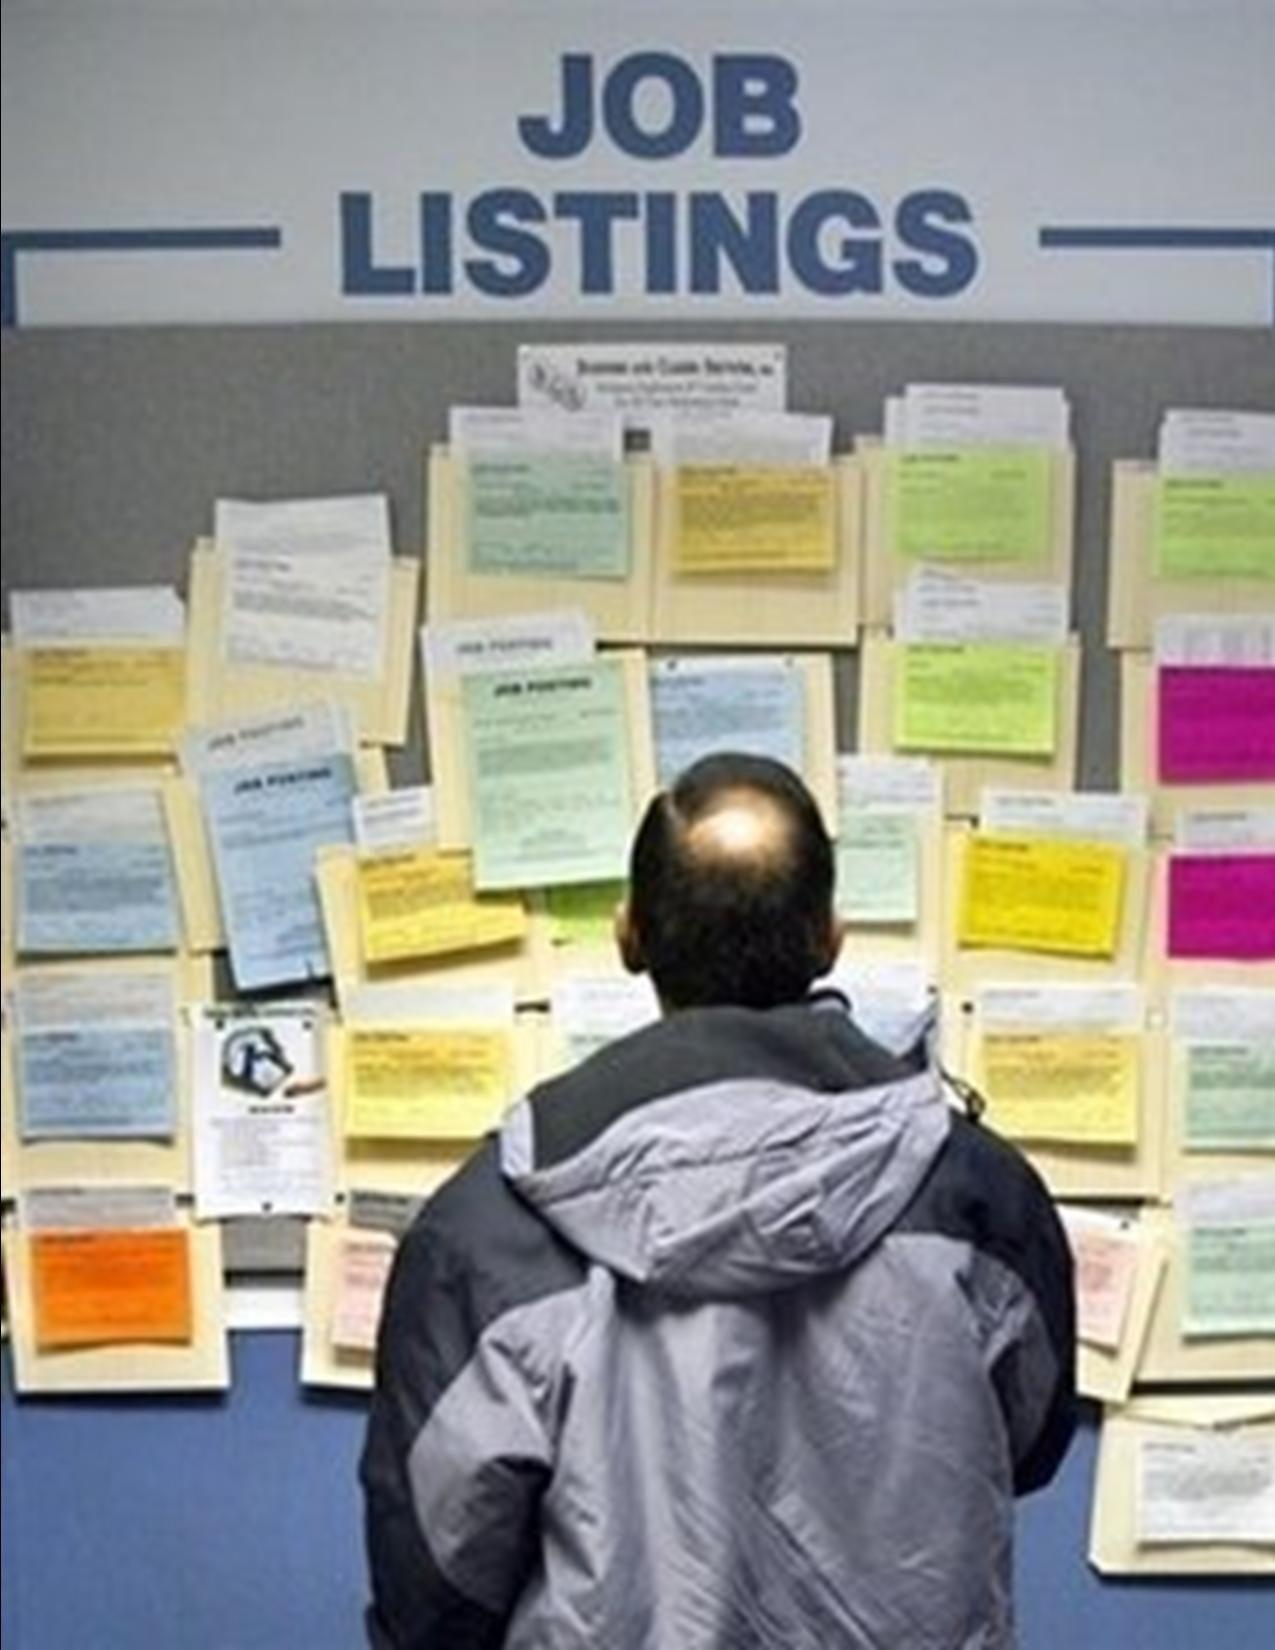 The Art of Job Hunting Job hunting, Marketing jobs, Jobs